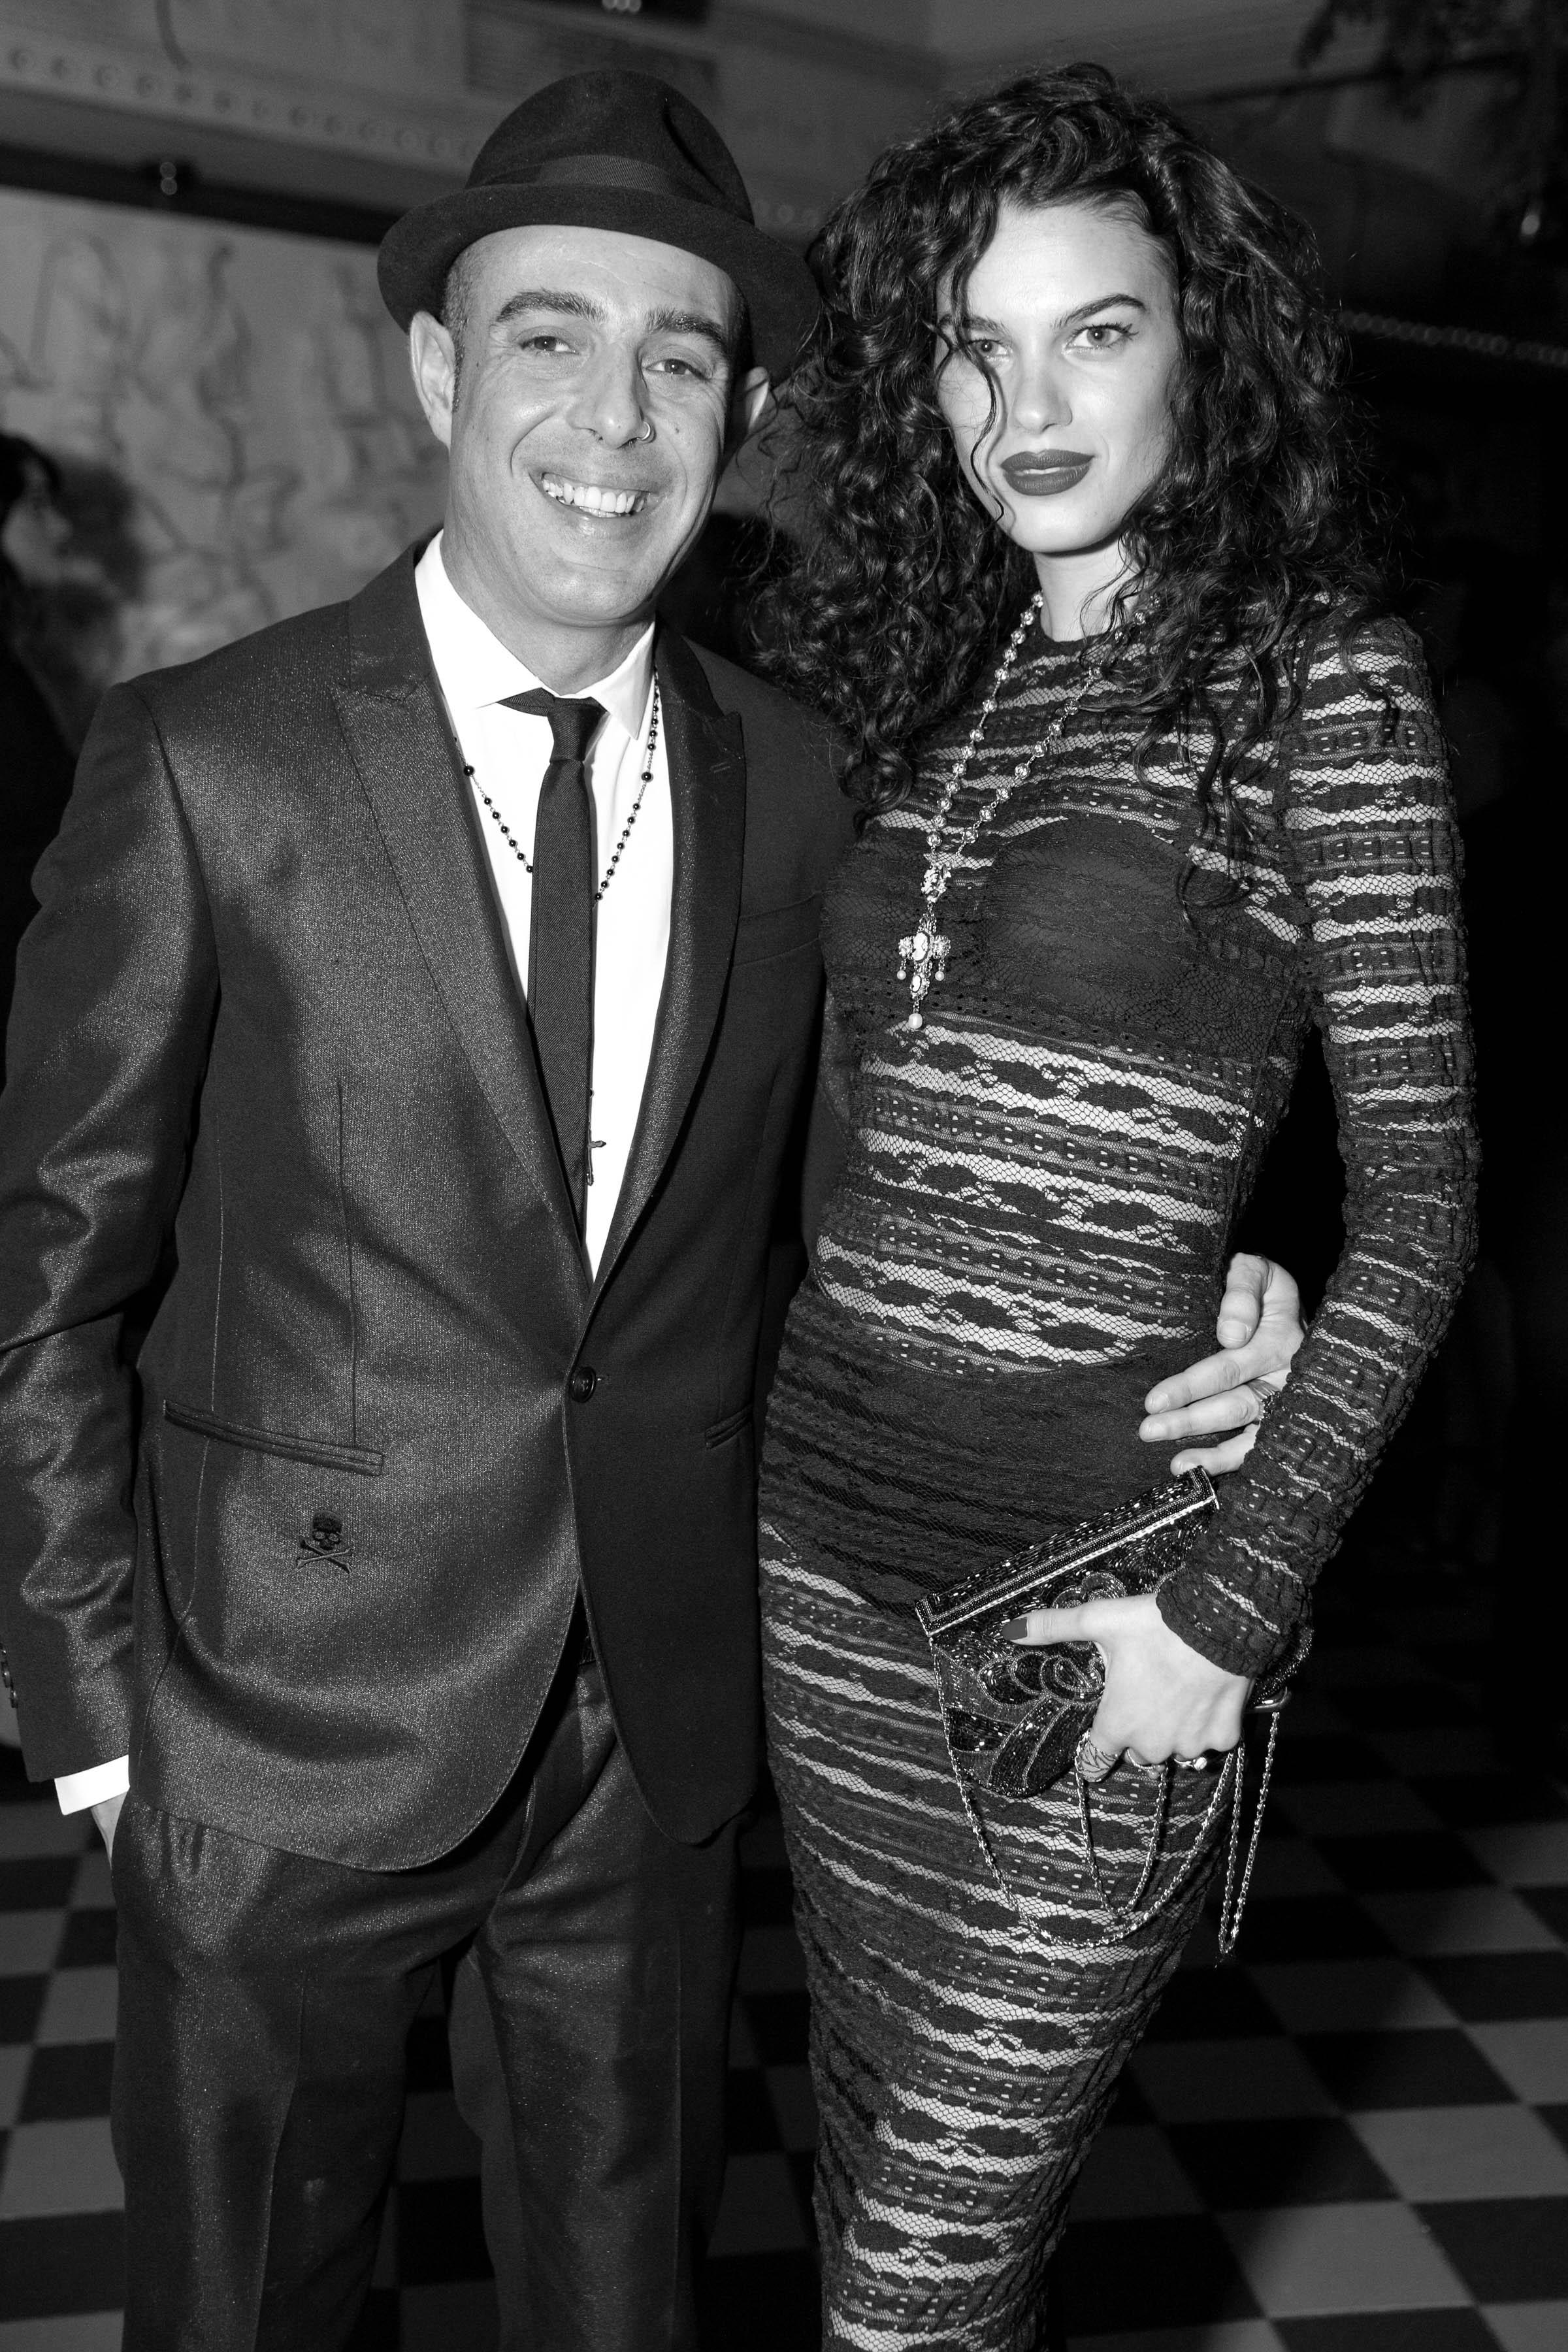 Rihannas 2018 Met Gala After Party - Armand de Brignac Champagne